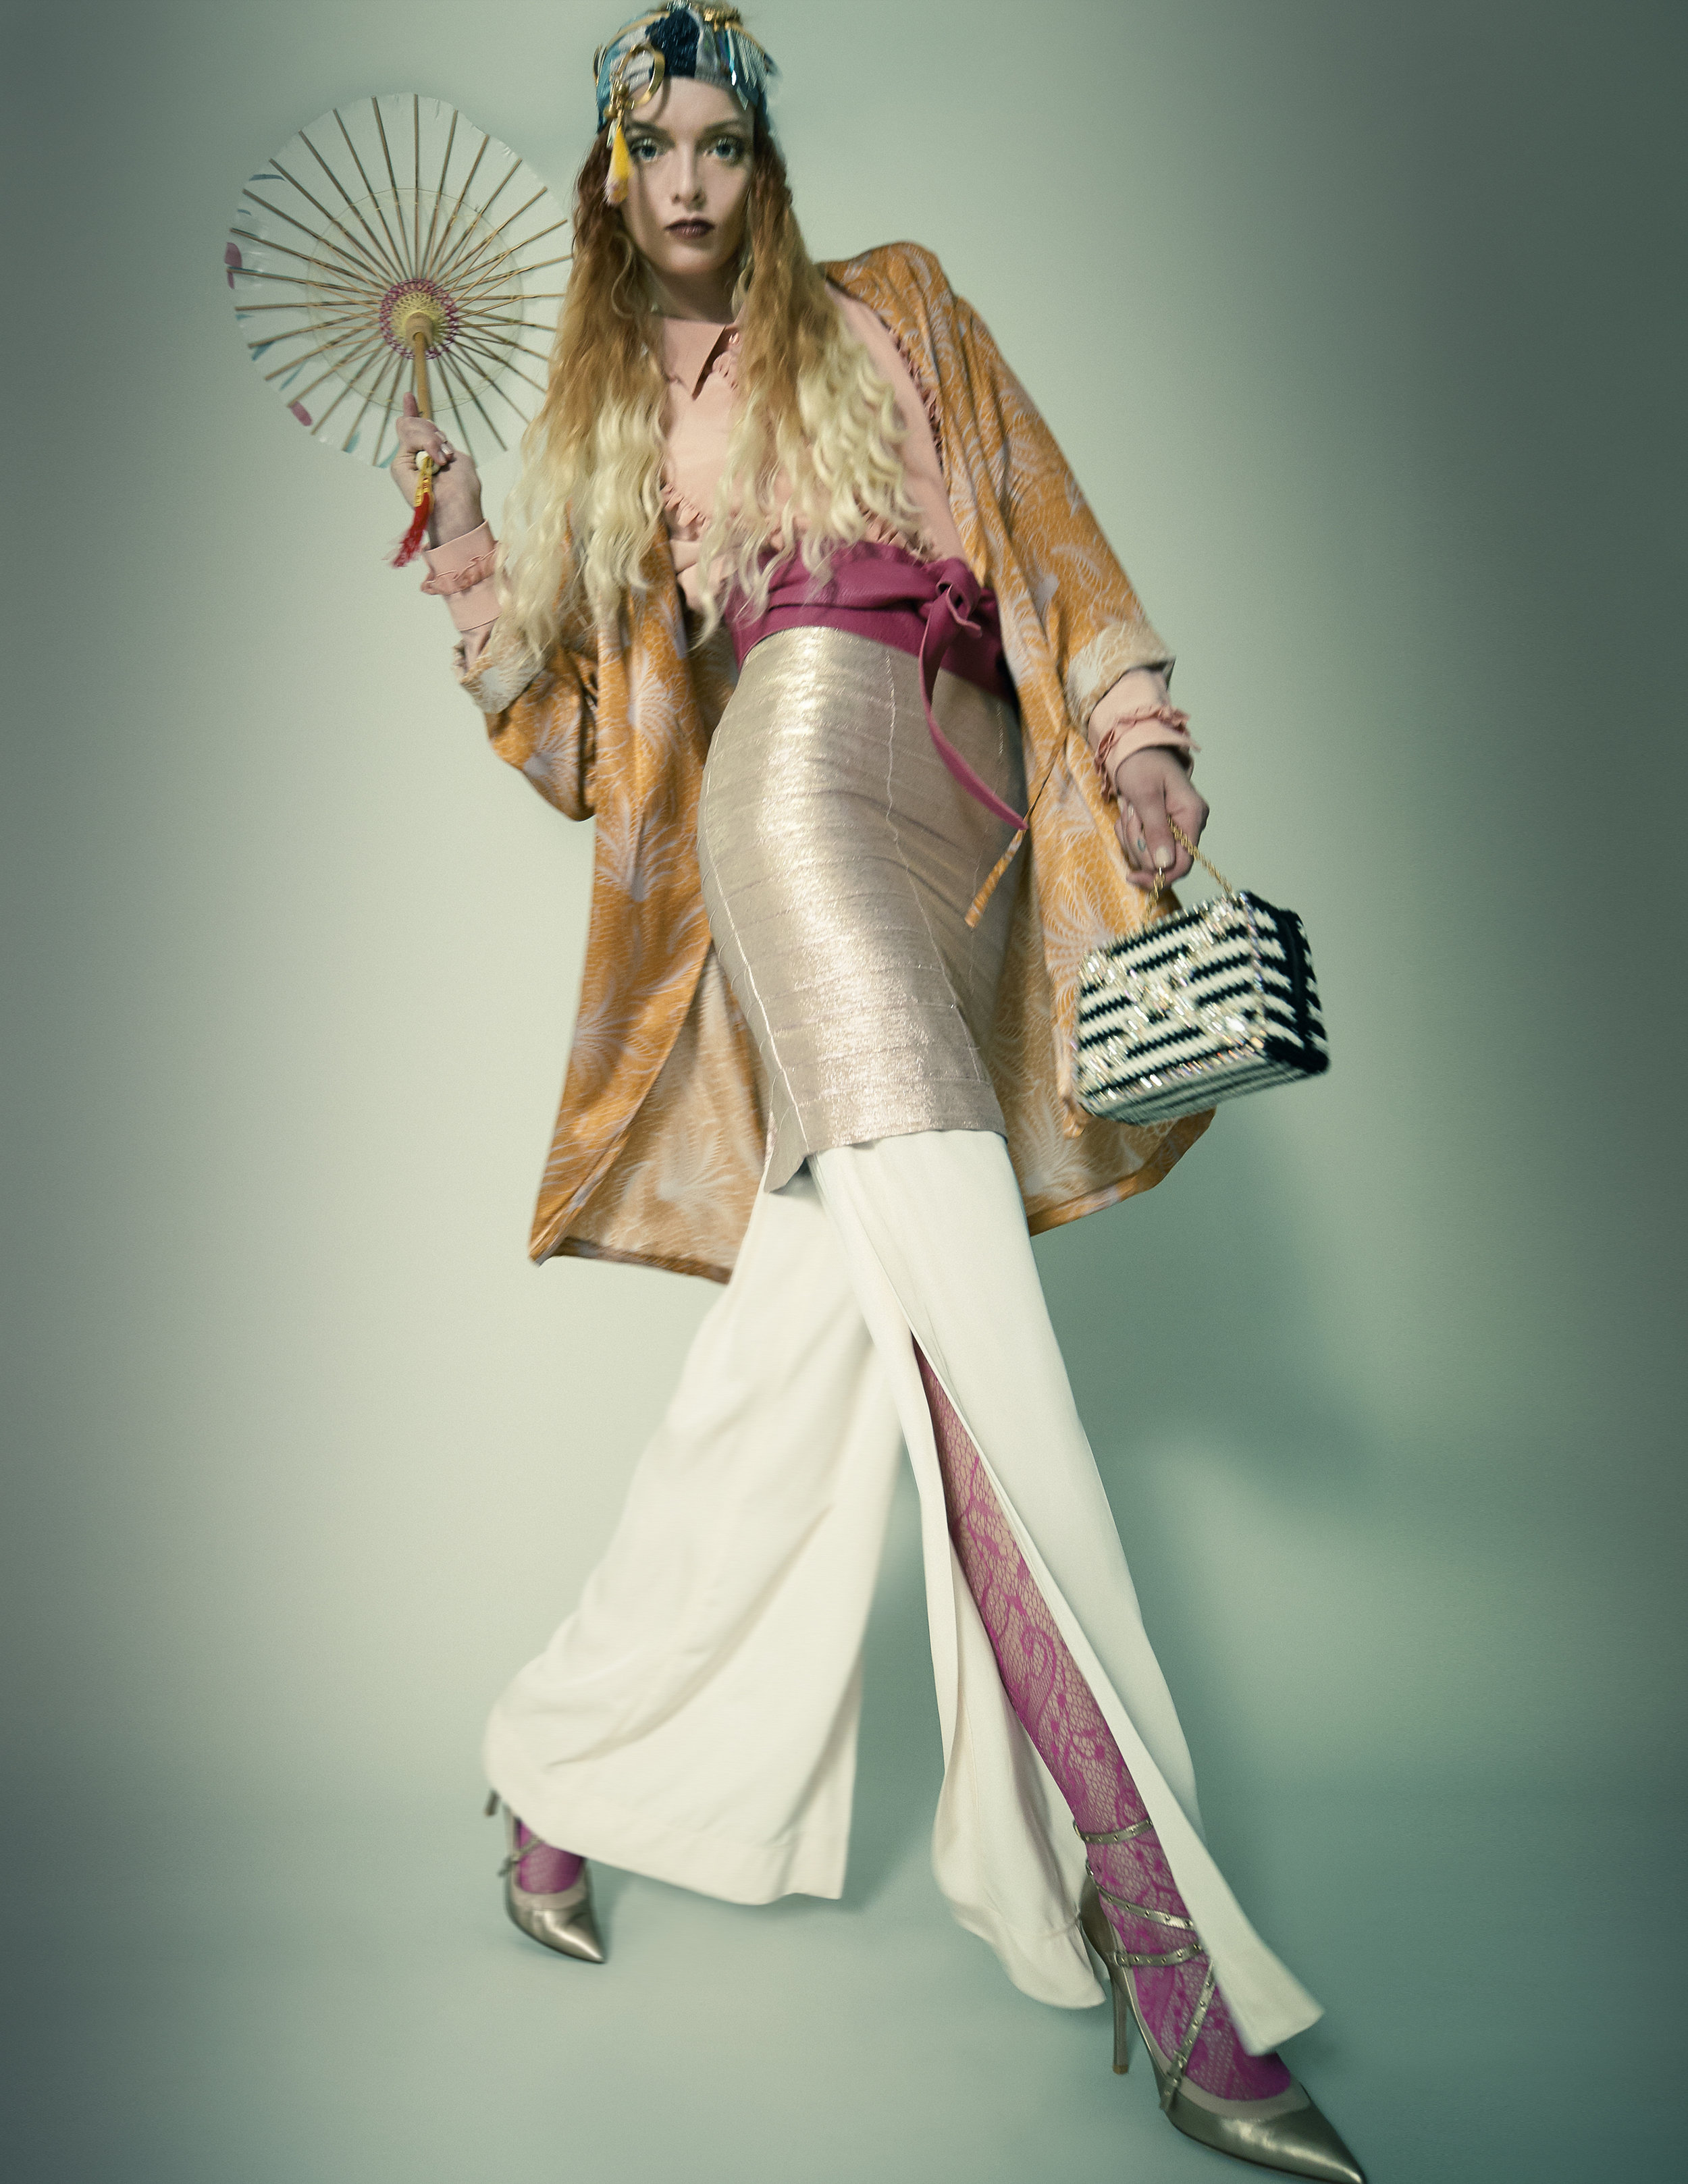 Shirt – RochasSkirt – Roseanna Trousers – Nenette Belt – Orciani Brooch – Chloé Necklace – Sciumé Headband – Circus Hotel Shoes – Valentino Kimono – Dries Van Noten Bag – Moschino